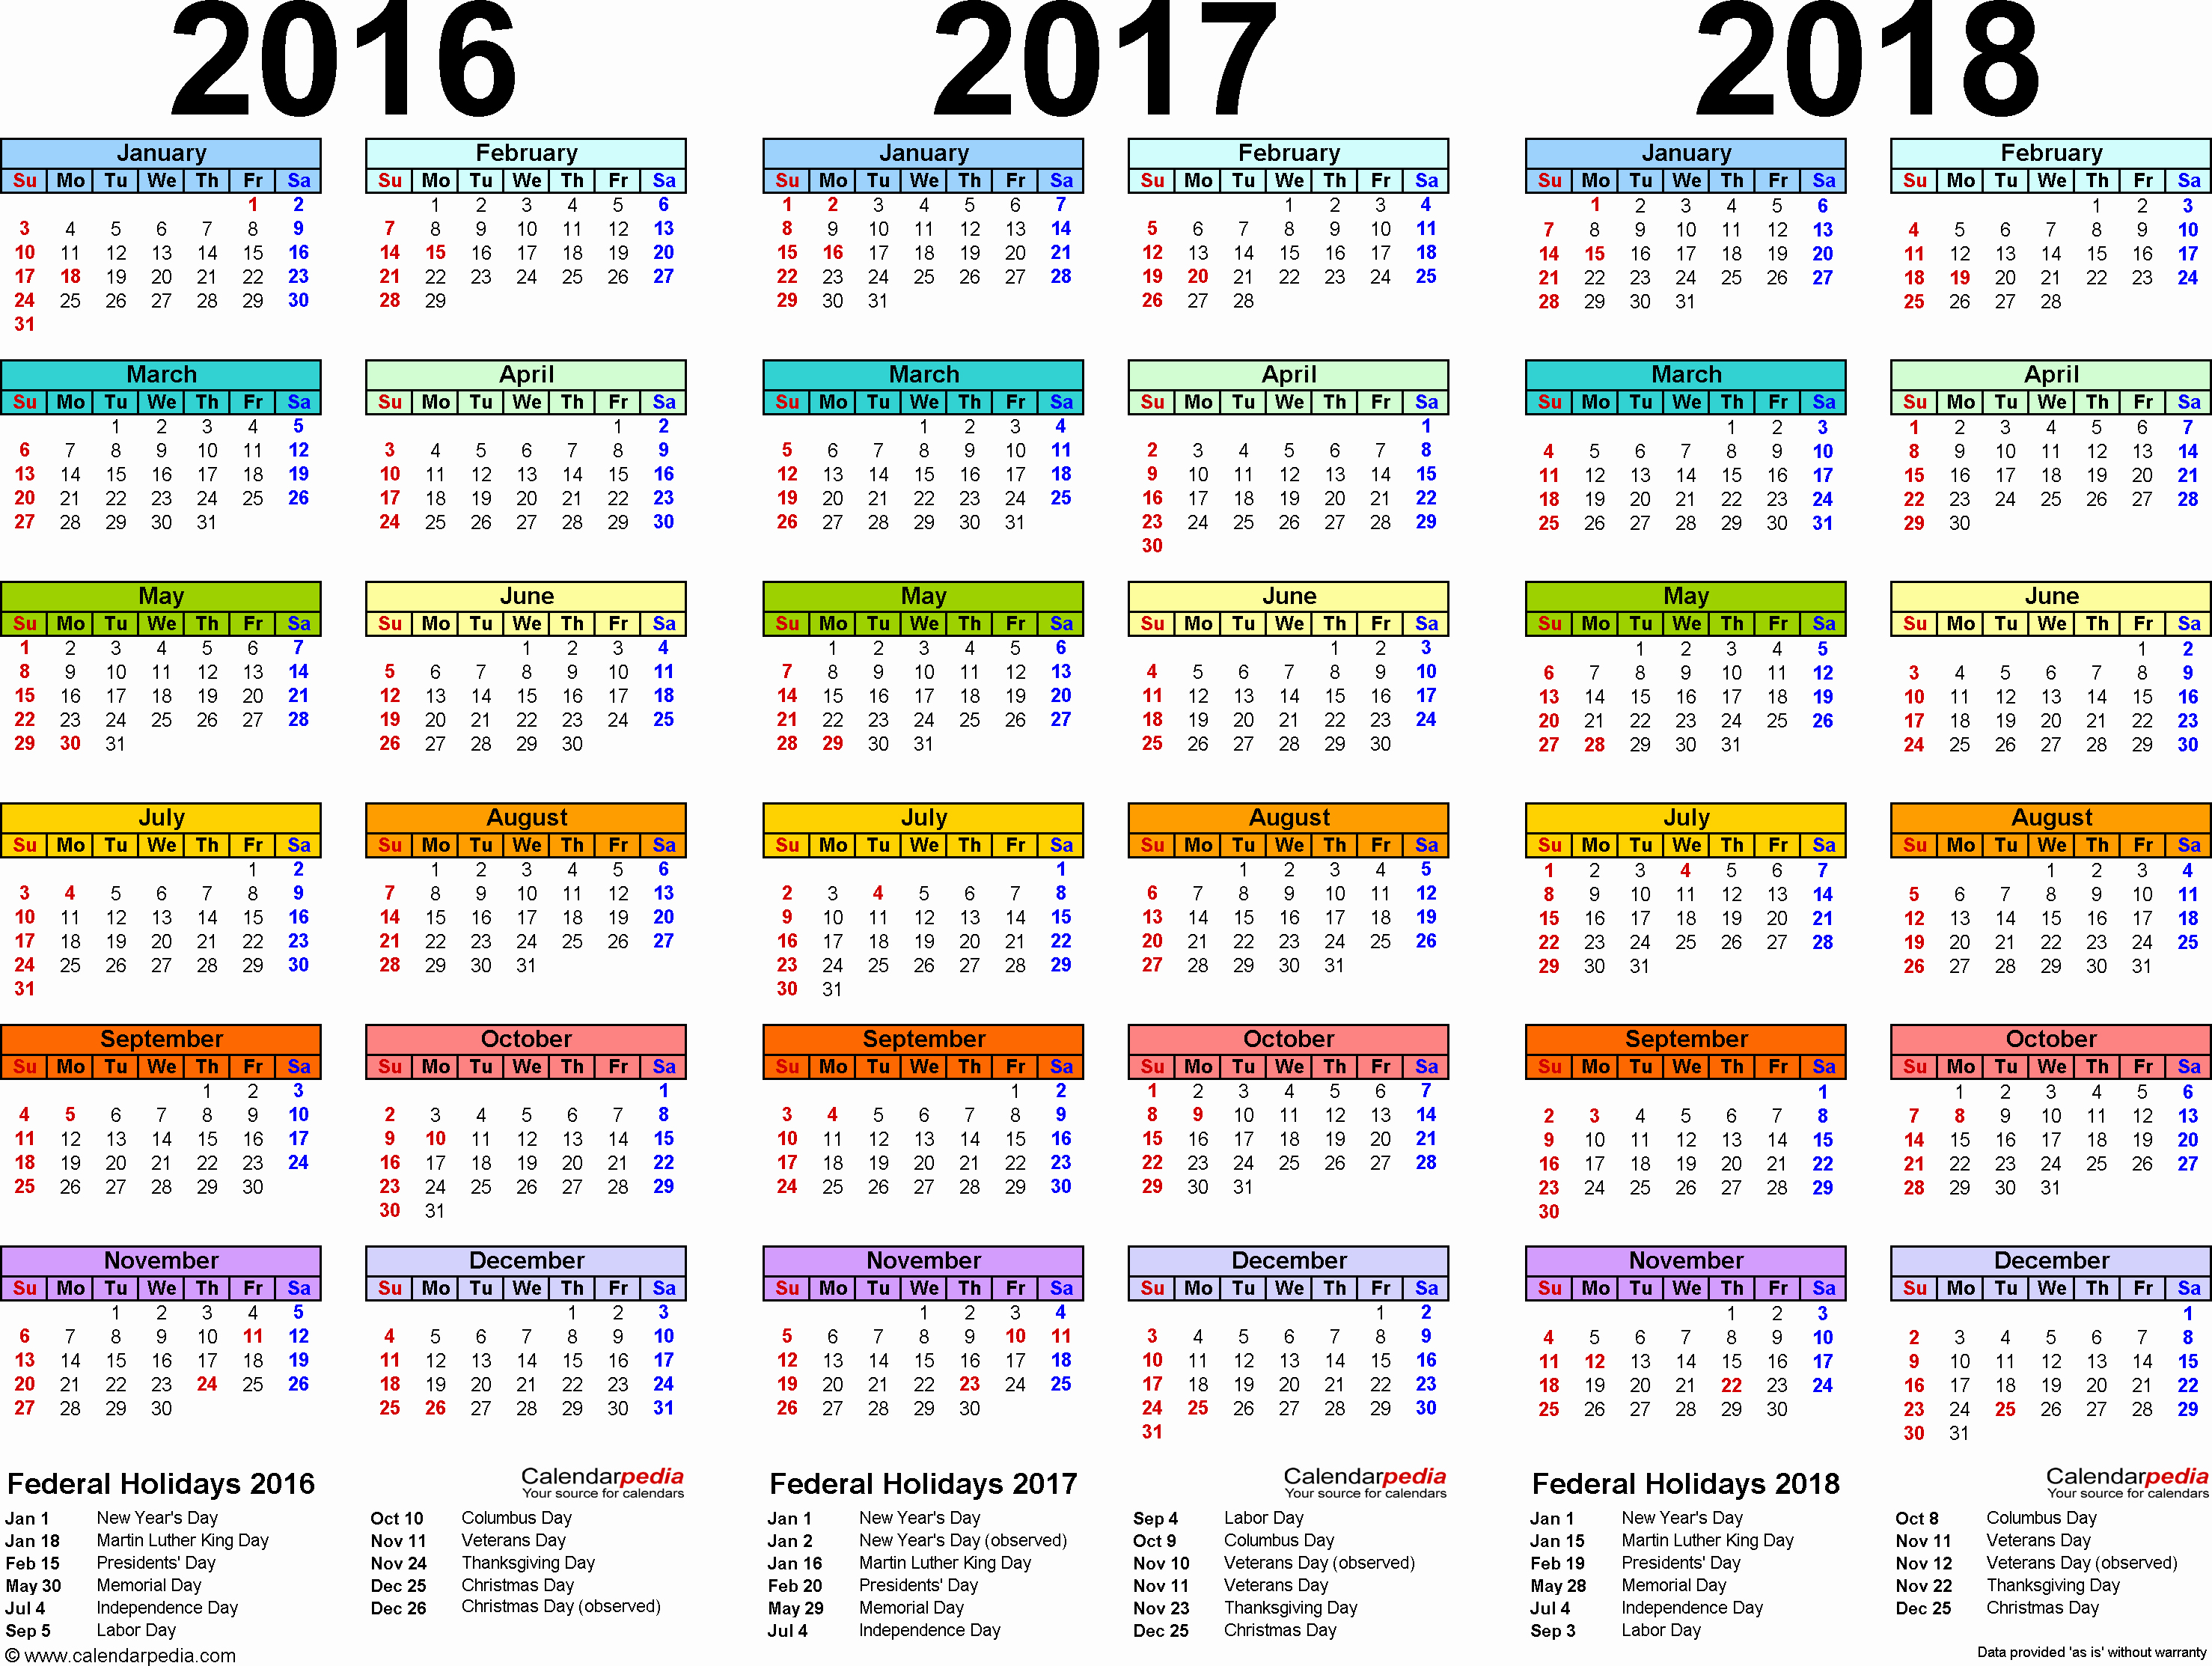 One Page Year Calendar 2017 Lovely 2016 2017 2018 Calendar 4 Three Year Printable Pdf Calendars